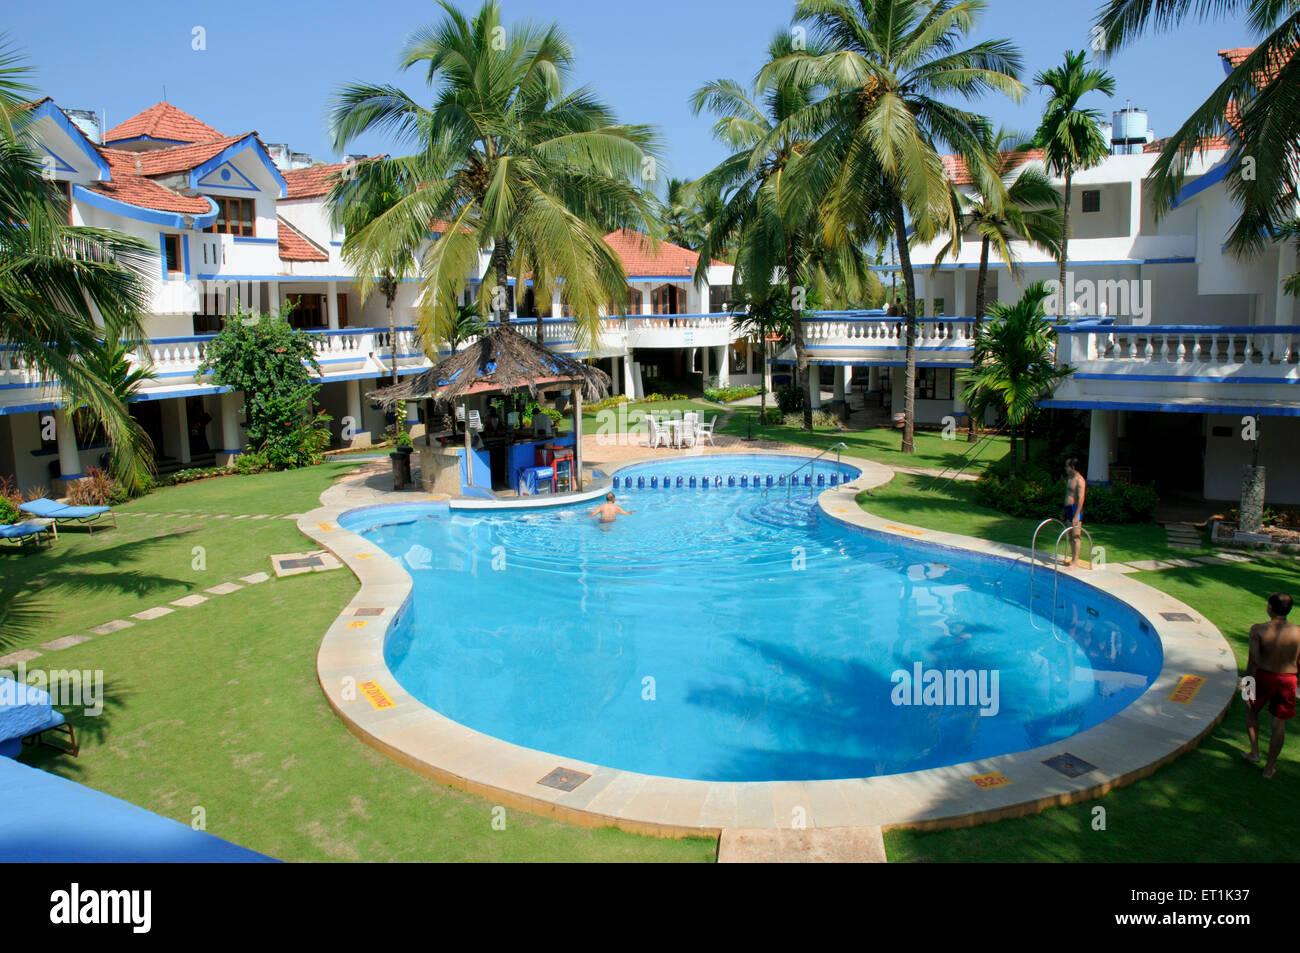 Royal goan beach club at benaulim ; Goa ; Maharashtra ; India 25 9 2010 NOPR - Stock Image